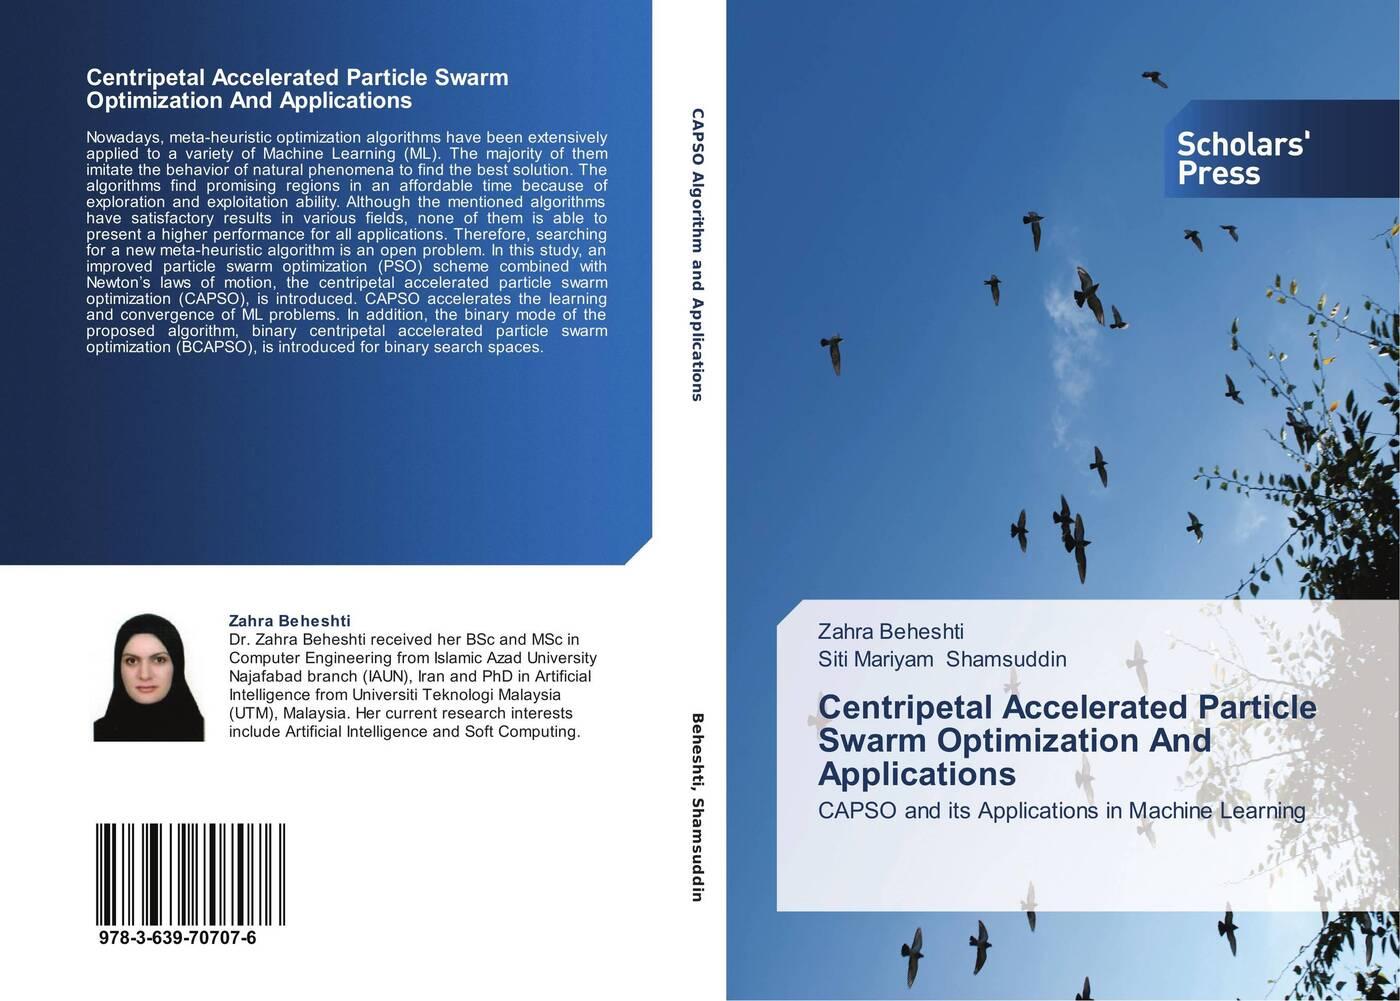 Zahra Beheshti and Siti Mariyam Shamsuddin Centripetal Accelerated Particle Swarm Optimization And Applications application of particle swarm optimization